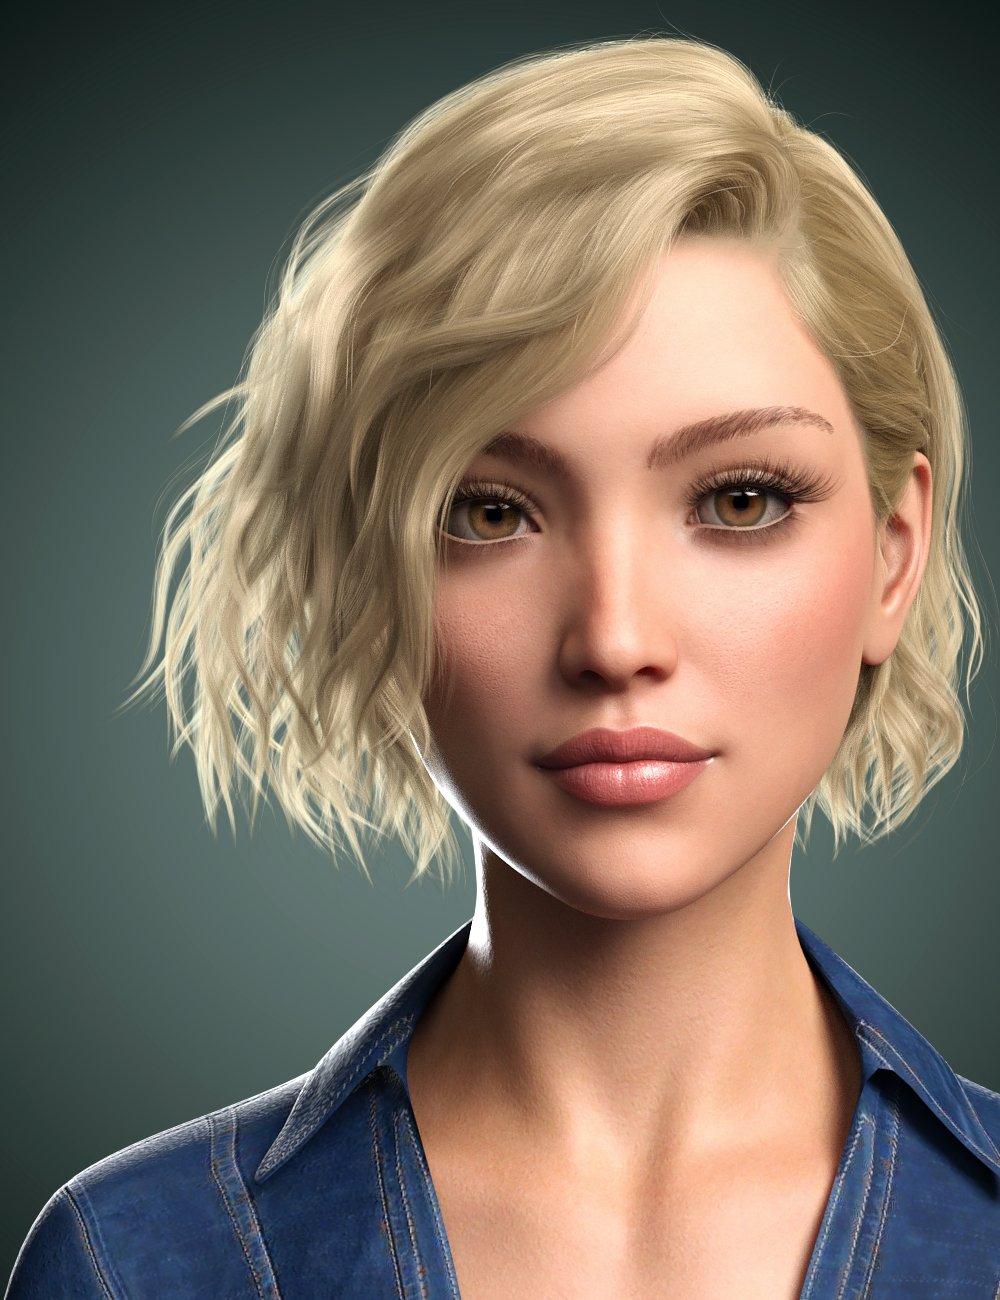 Karla Hair for Genesis 8 Female(s) by: WindField, 3D Models by Daz 3D